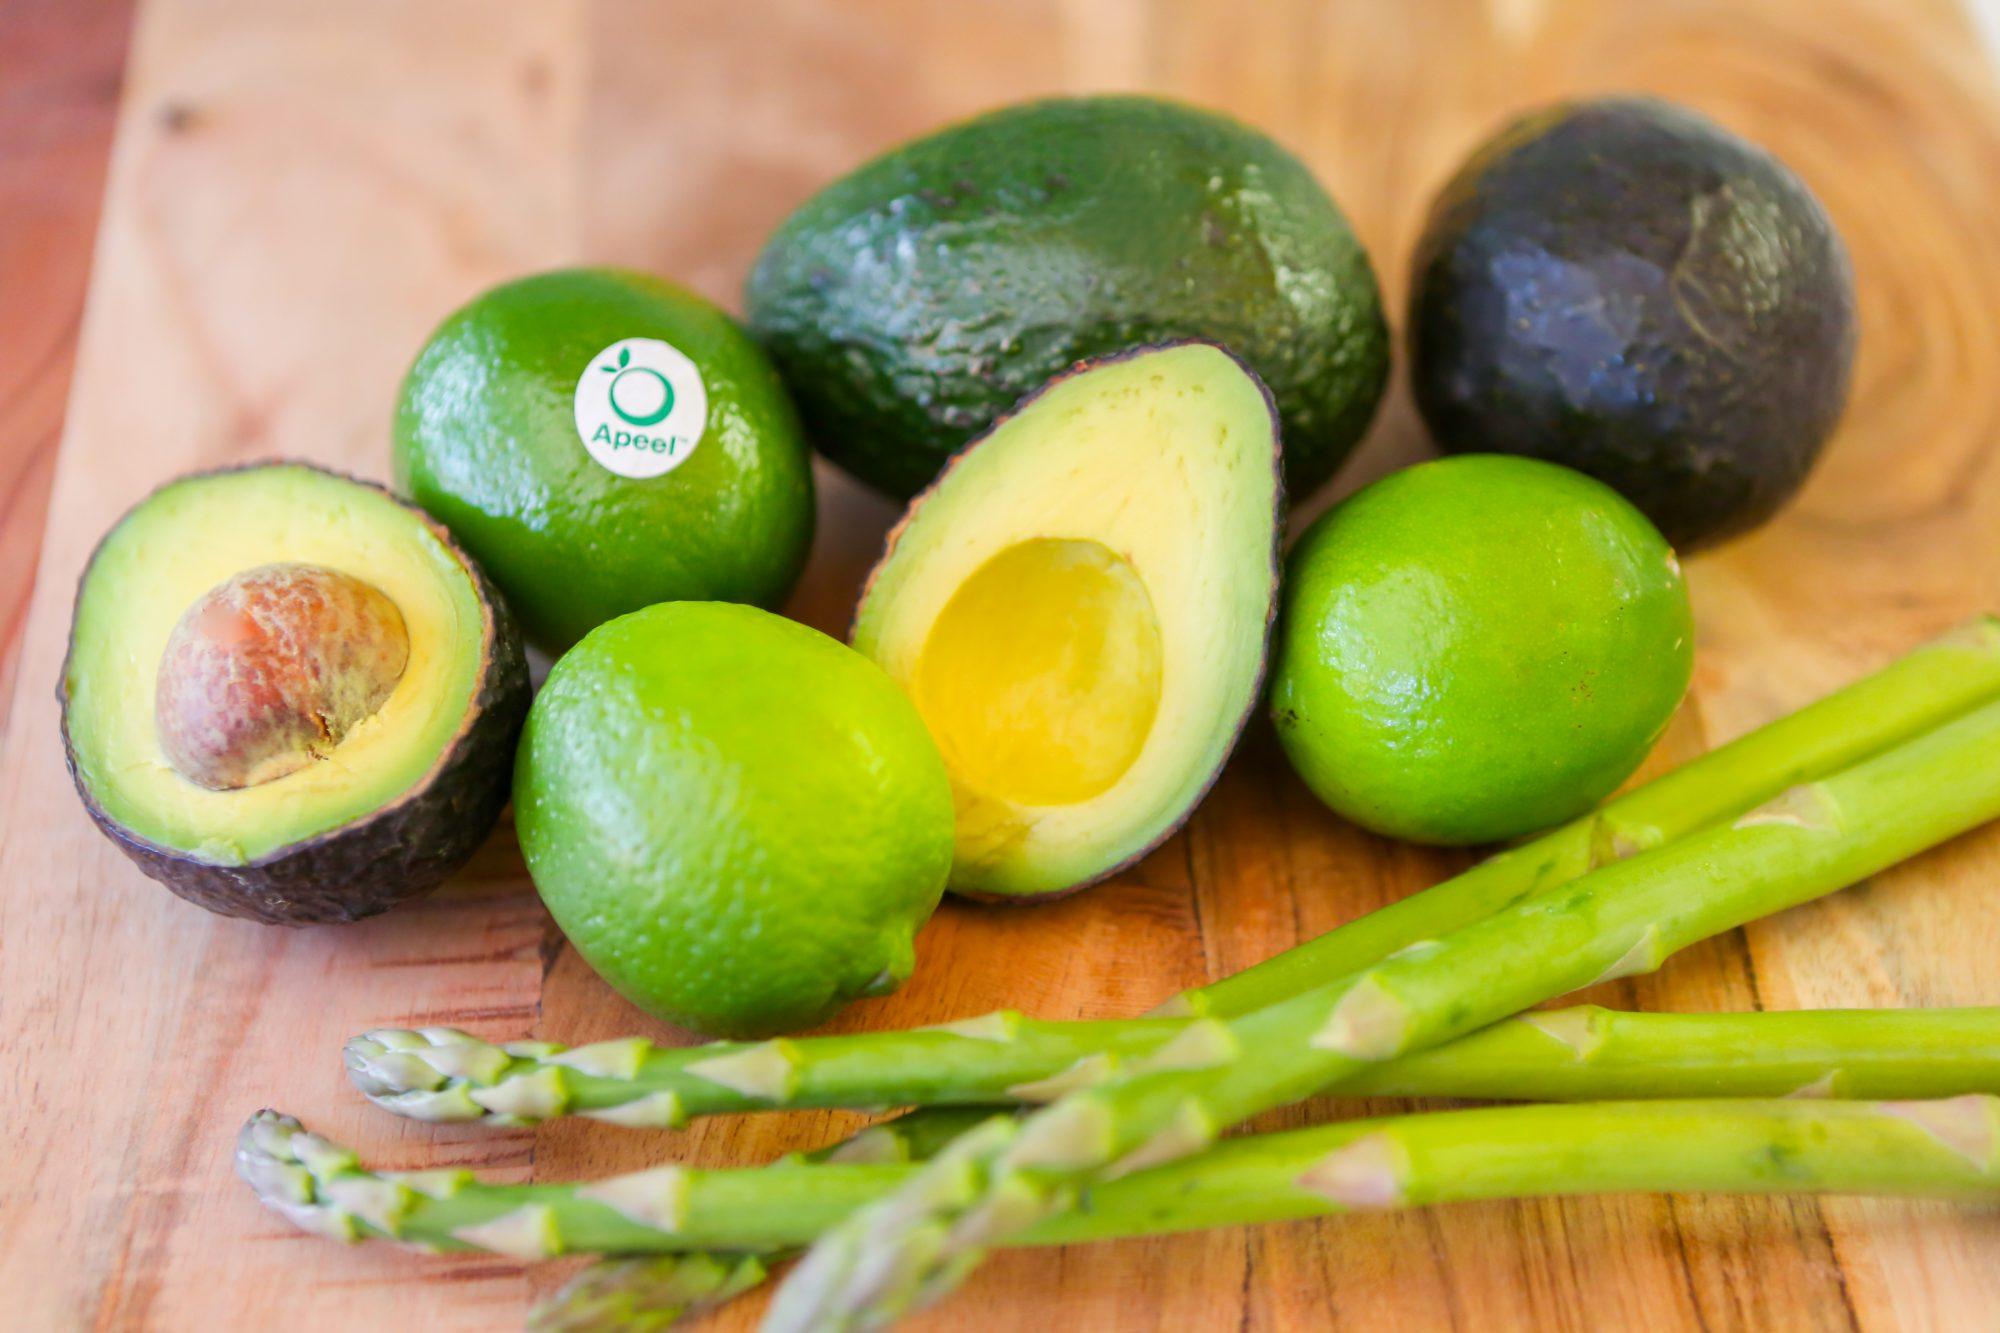 mr Avocado Apeel.jpg